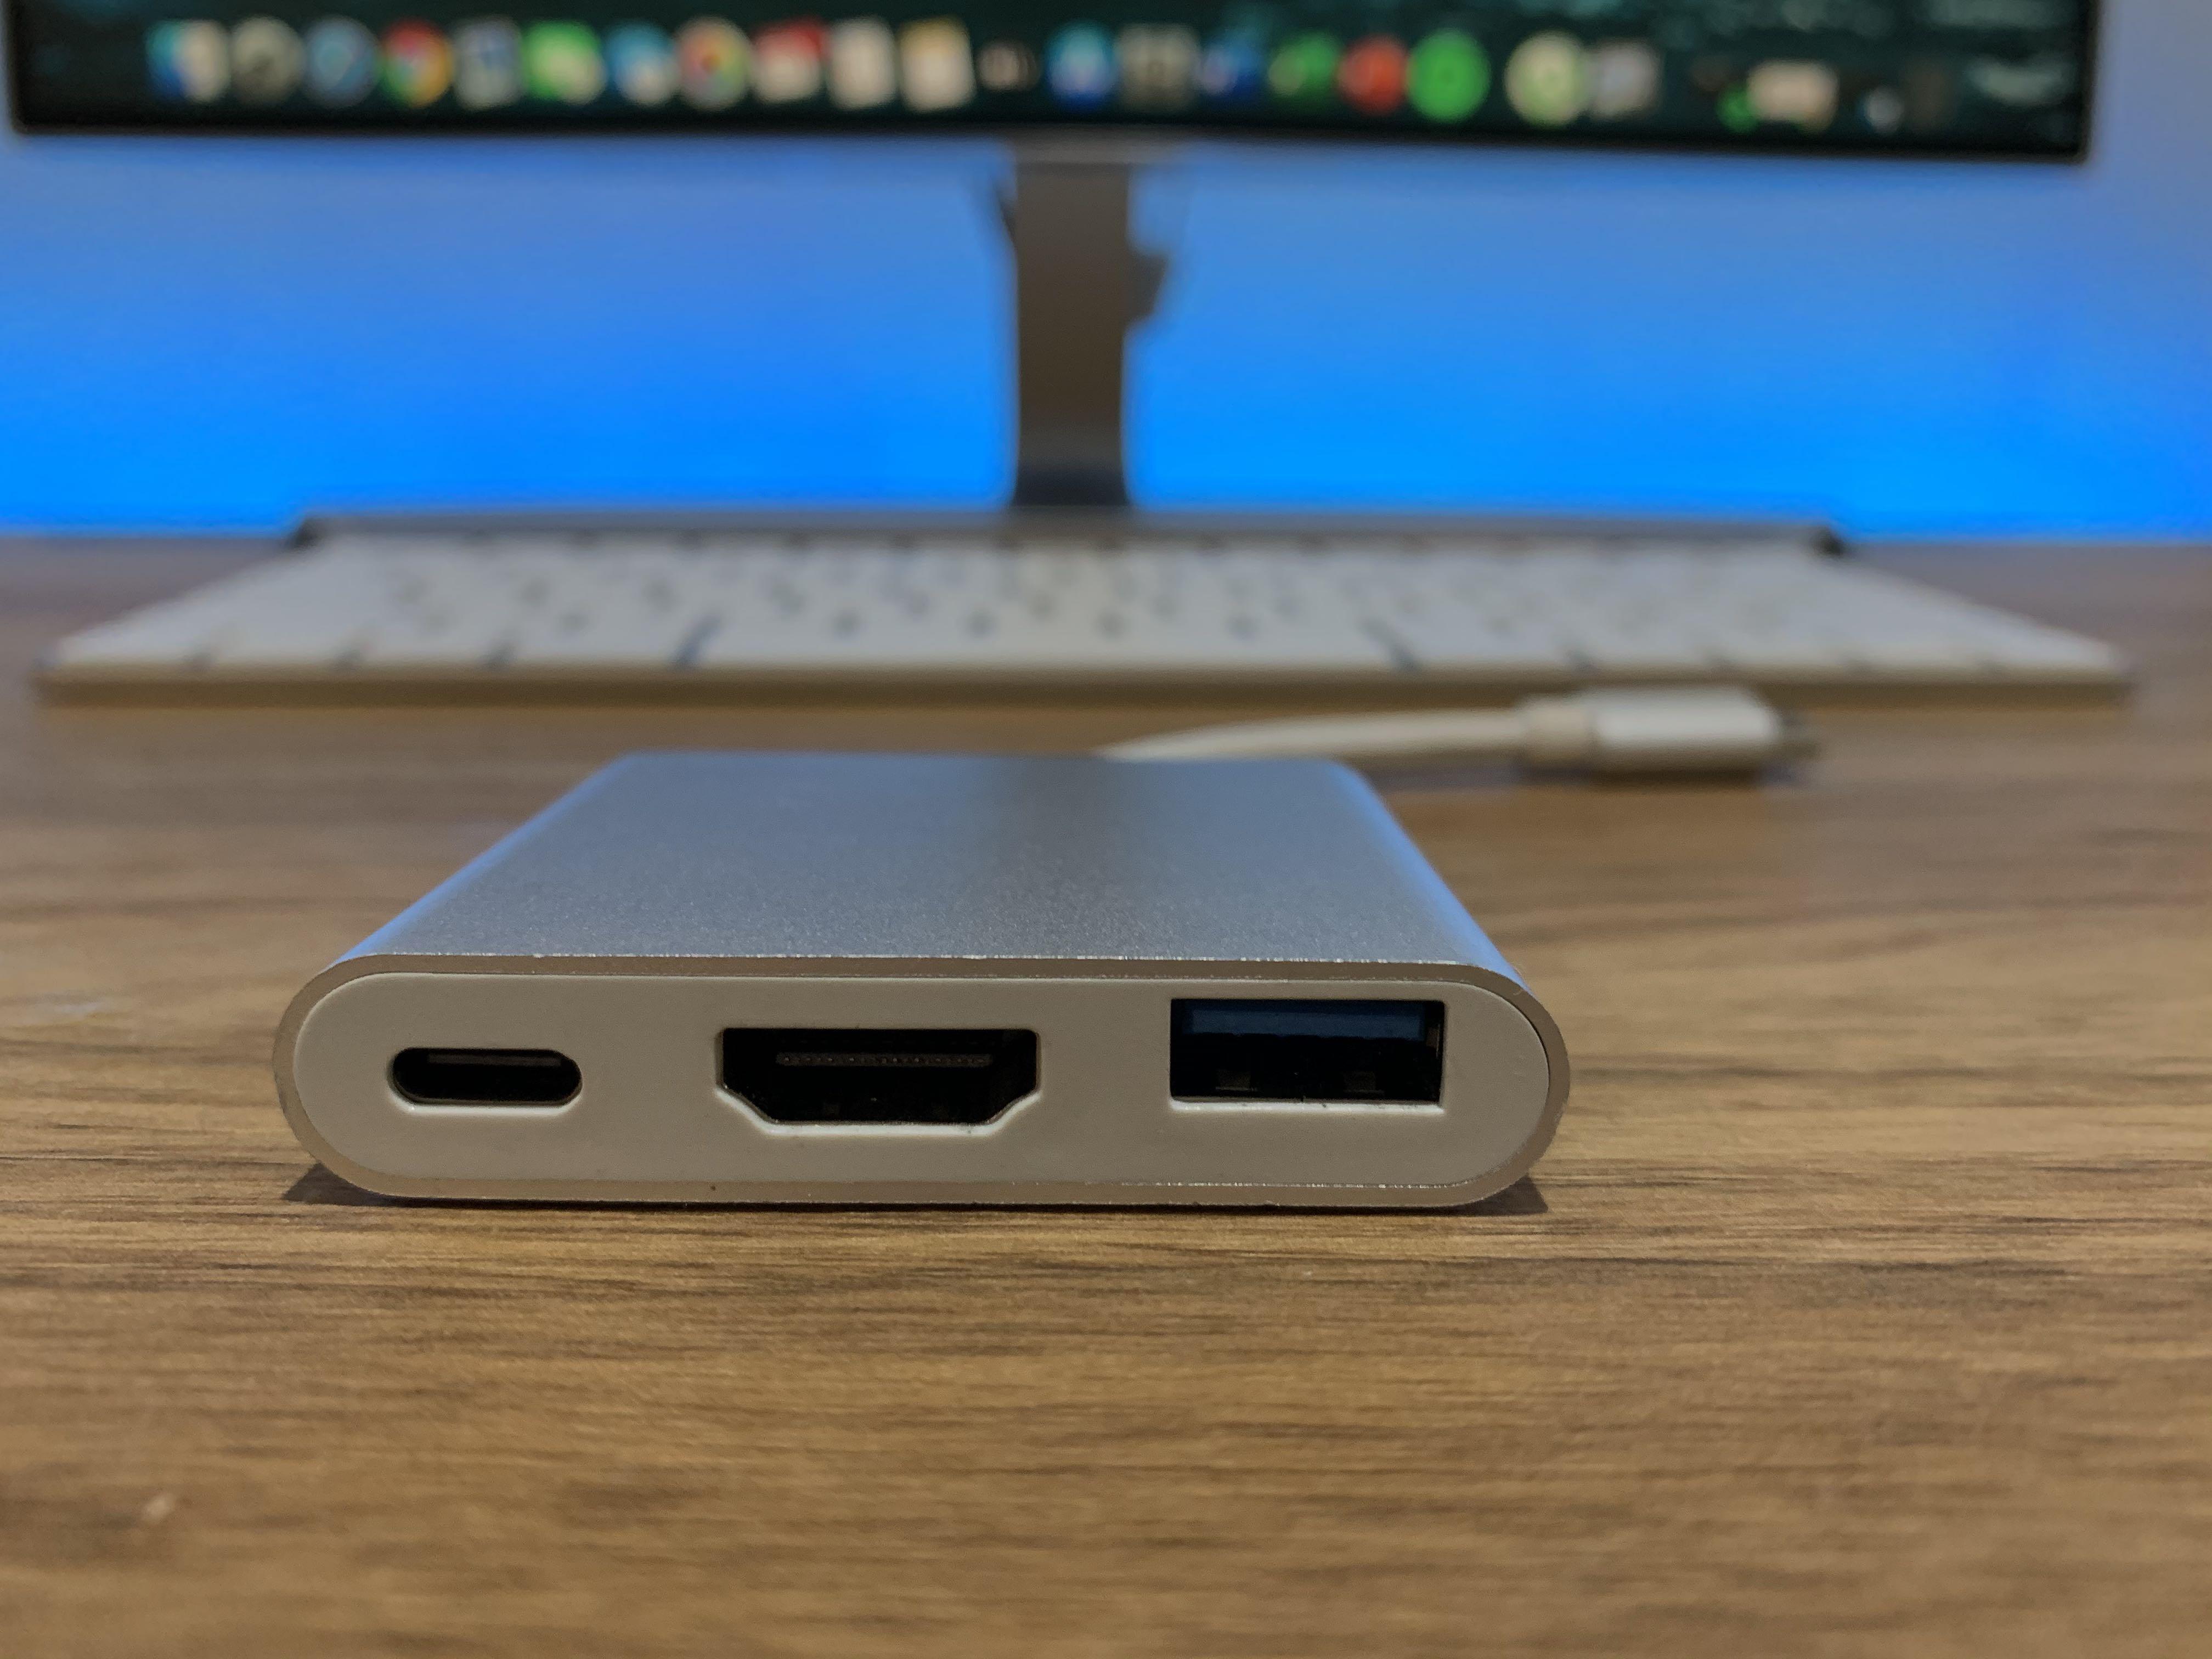 Premium Dongle USB type C / Adapter USB C